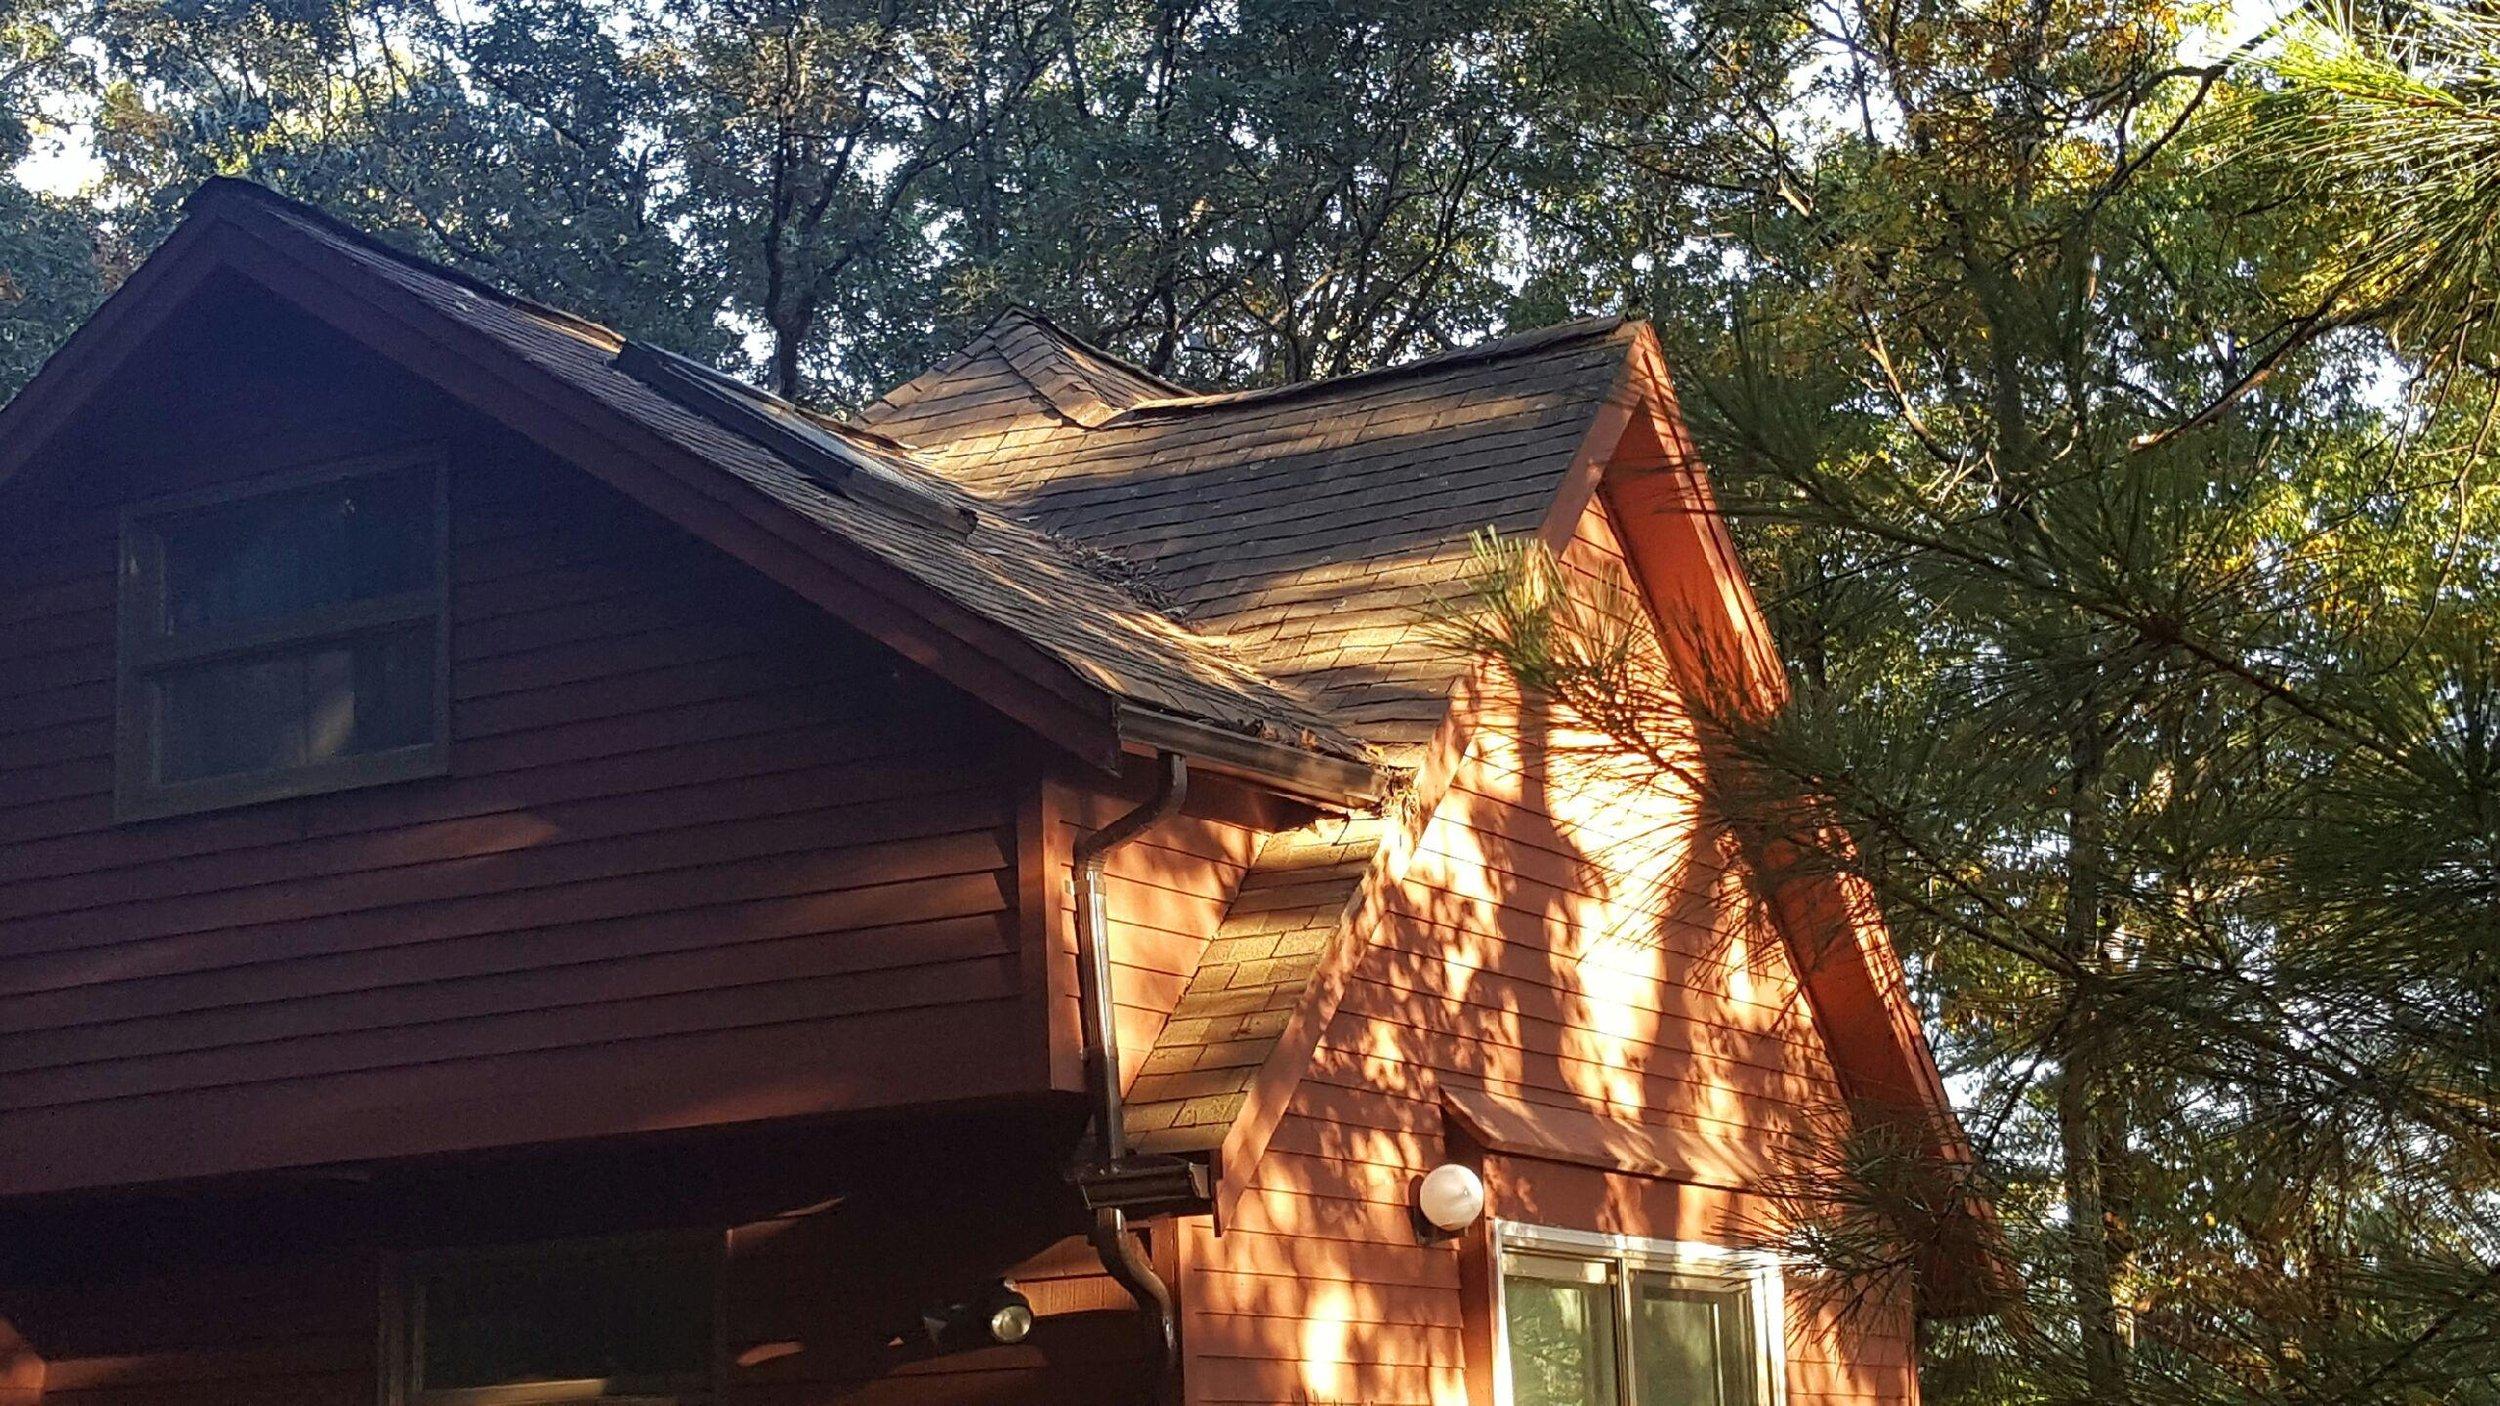 Rustic Galvanized Metal Roof in Hudson - Before